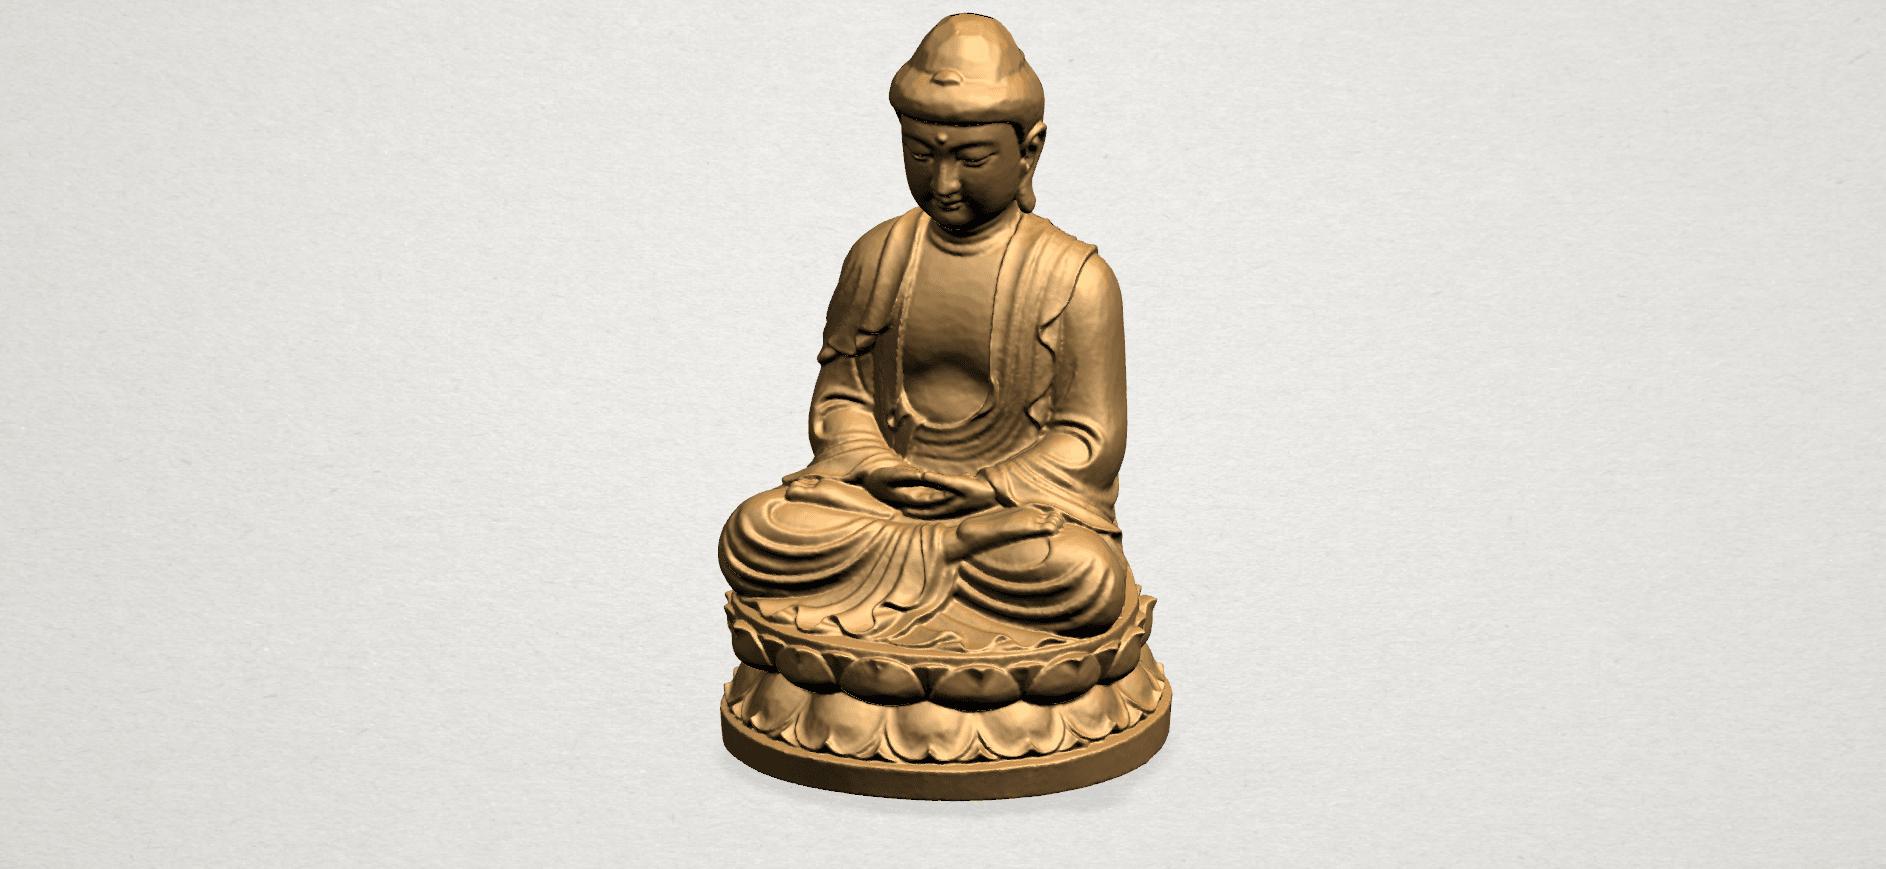 Gautama Buddha young - B02.png Télécharger fichier STL gratuit Gautama Bouddha Bouddha • Objet imprimable en 3D, GeorgesNikkei